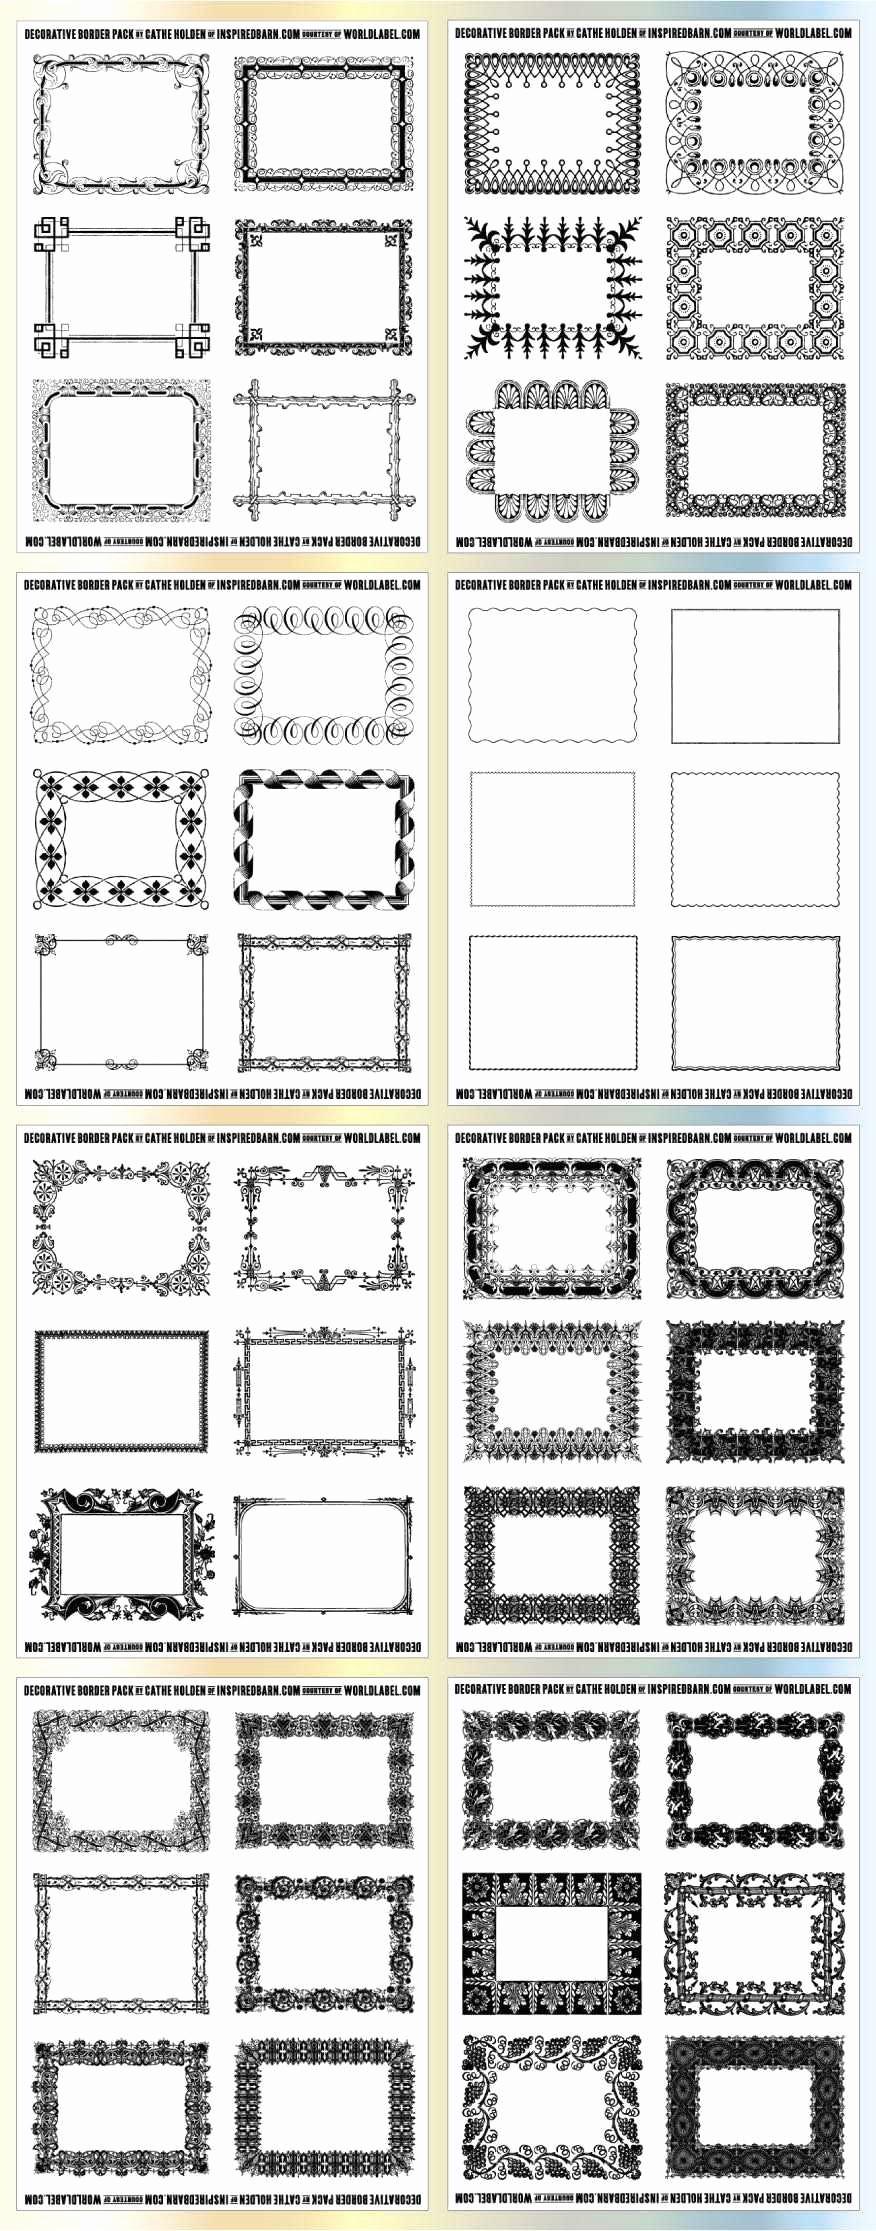 Labels Template 30 Per Sheet Inspirational Avery Template 30 Labels Per Sheet Kalei Document